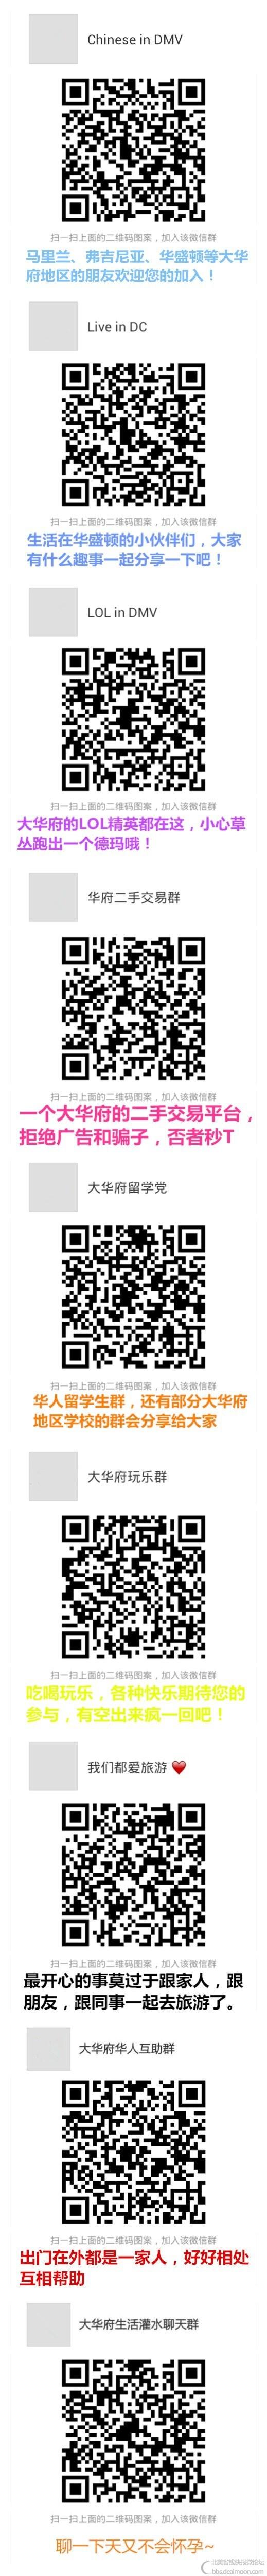 DMV生活微信群.jpg